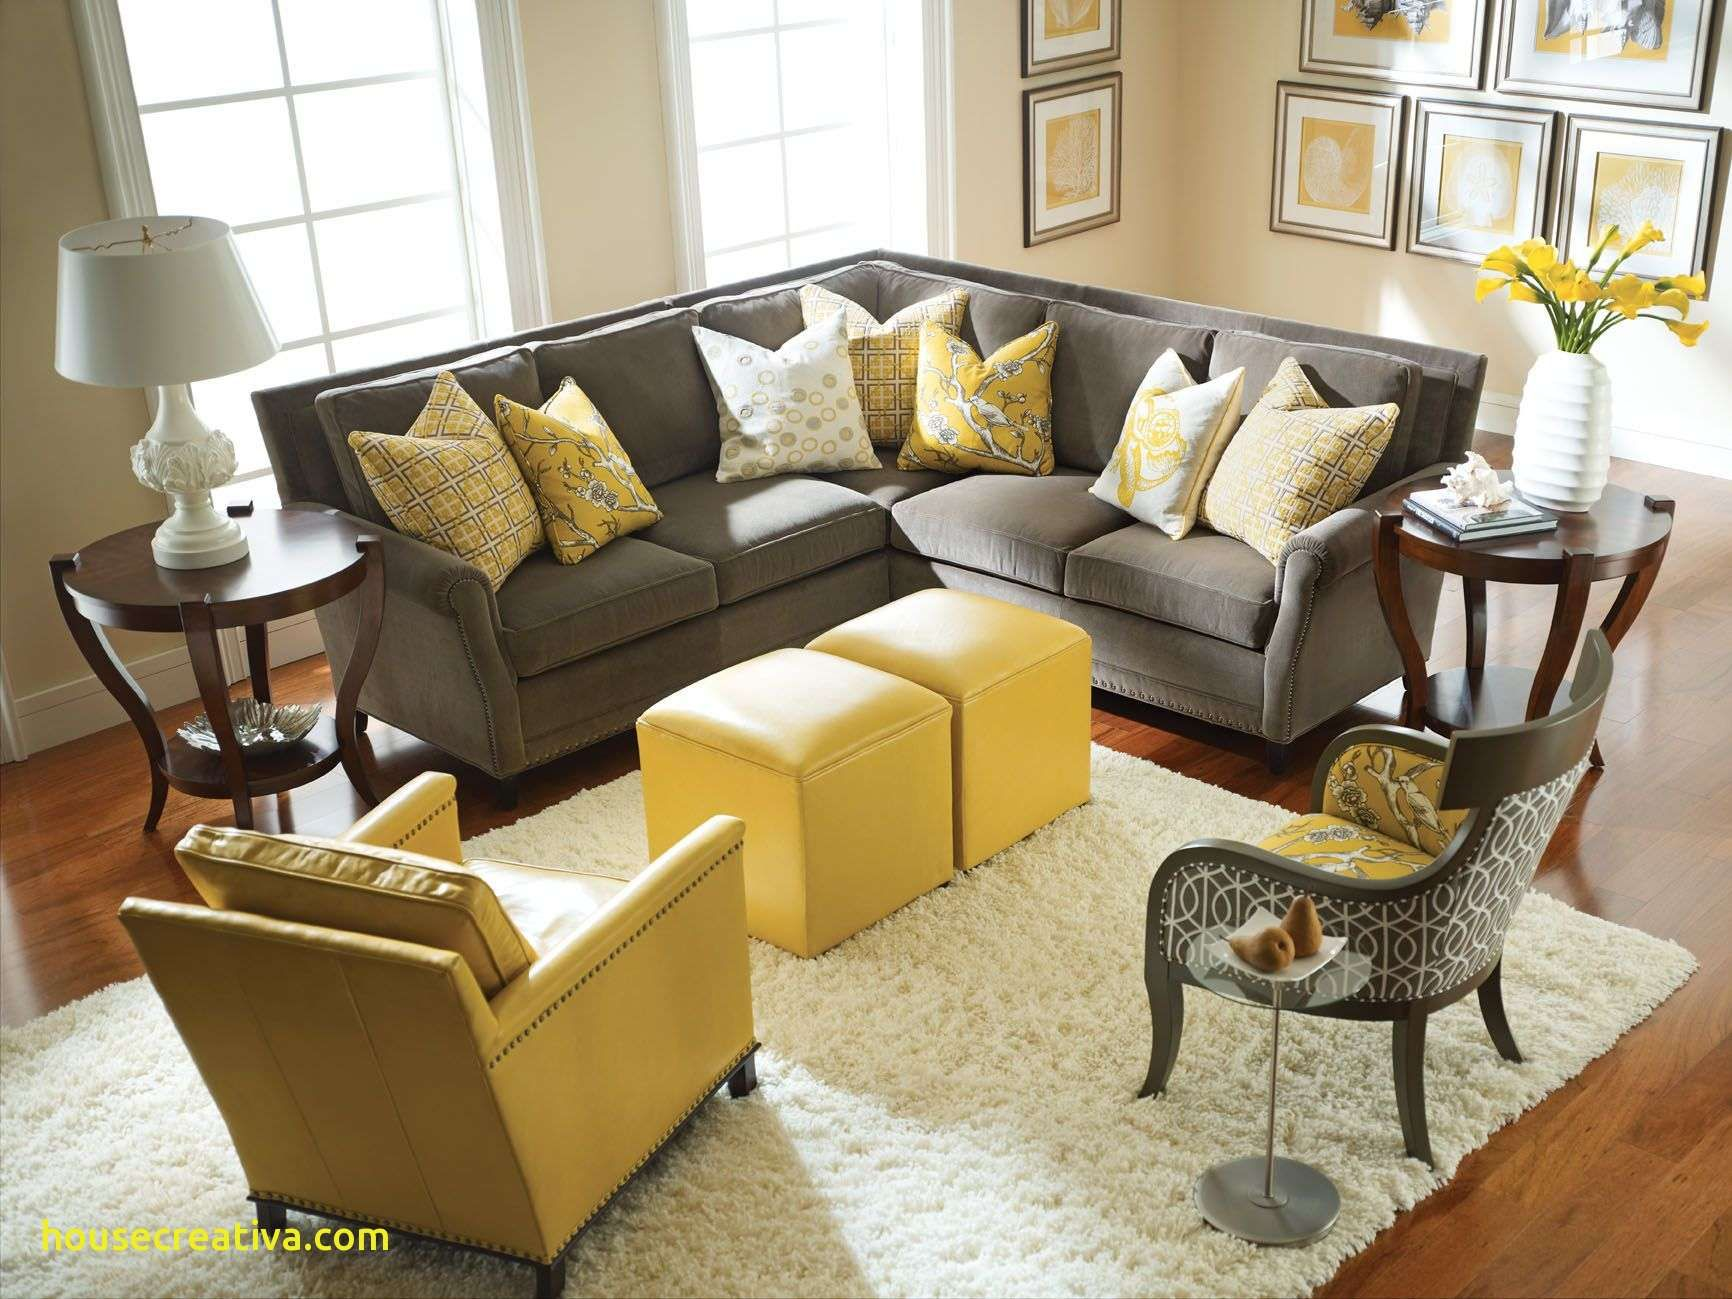 Elegant Red And Mustard Living Room Homedecoration